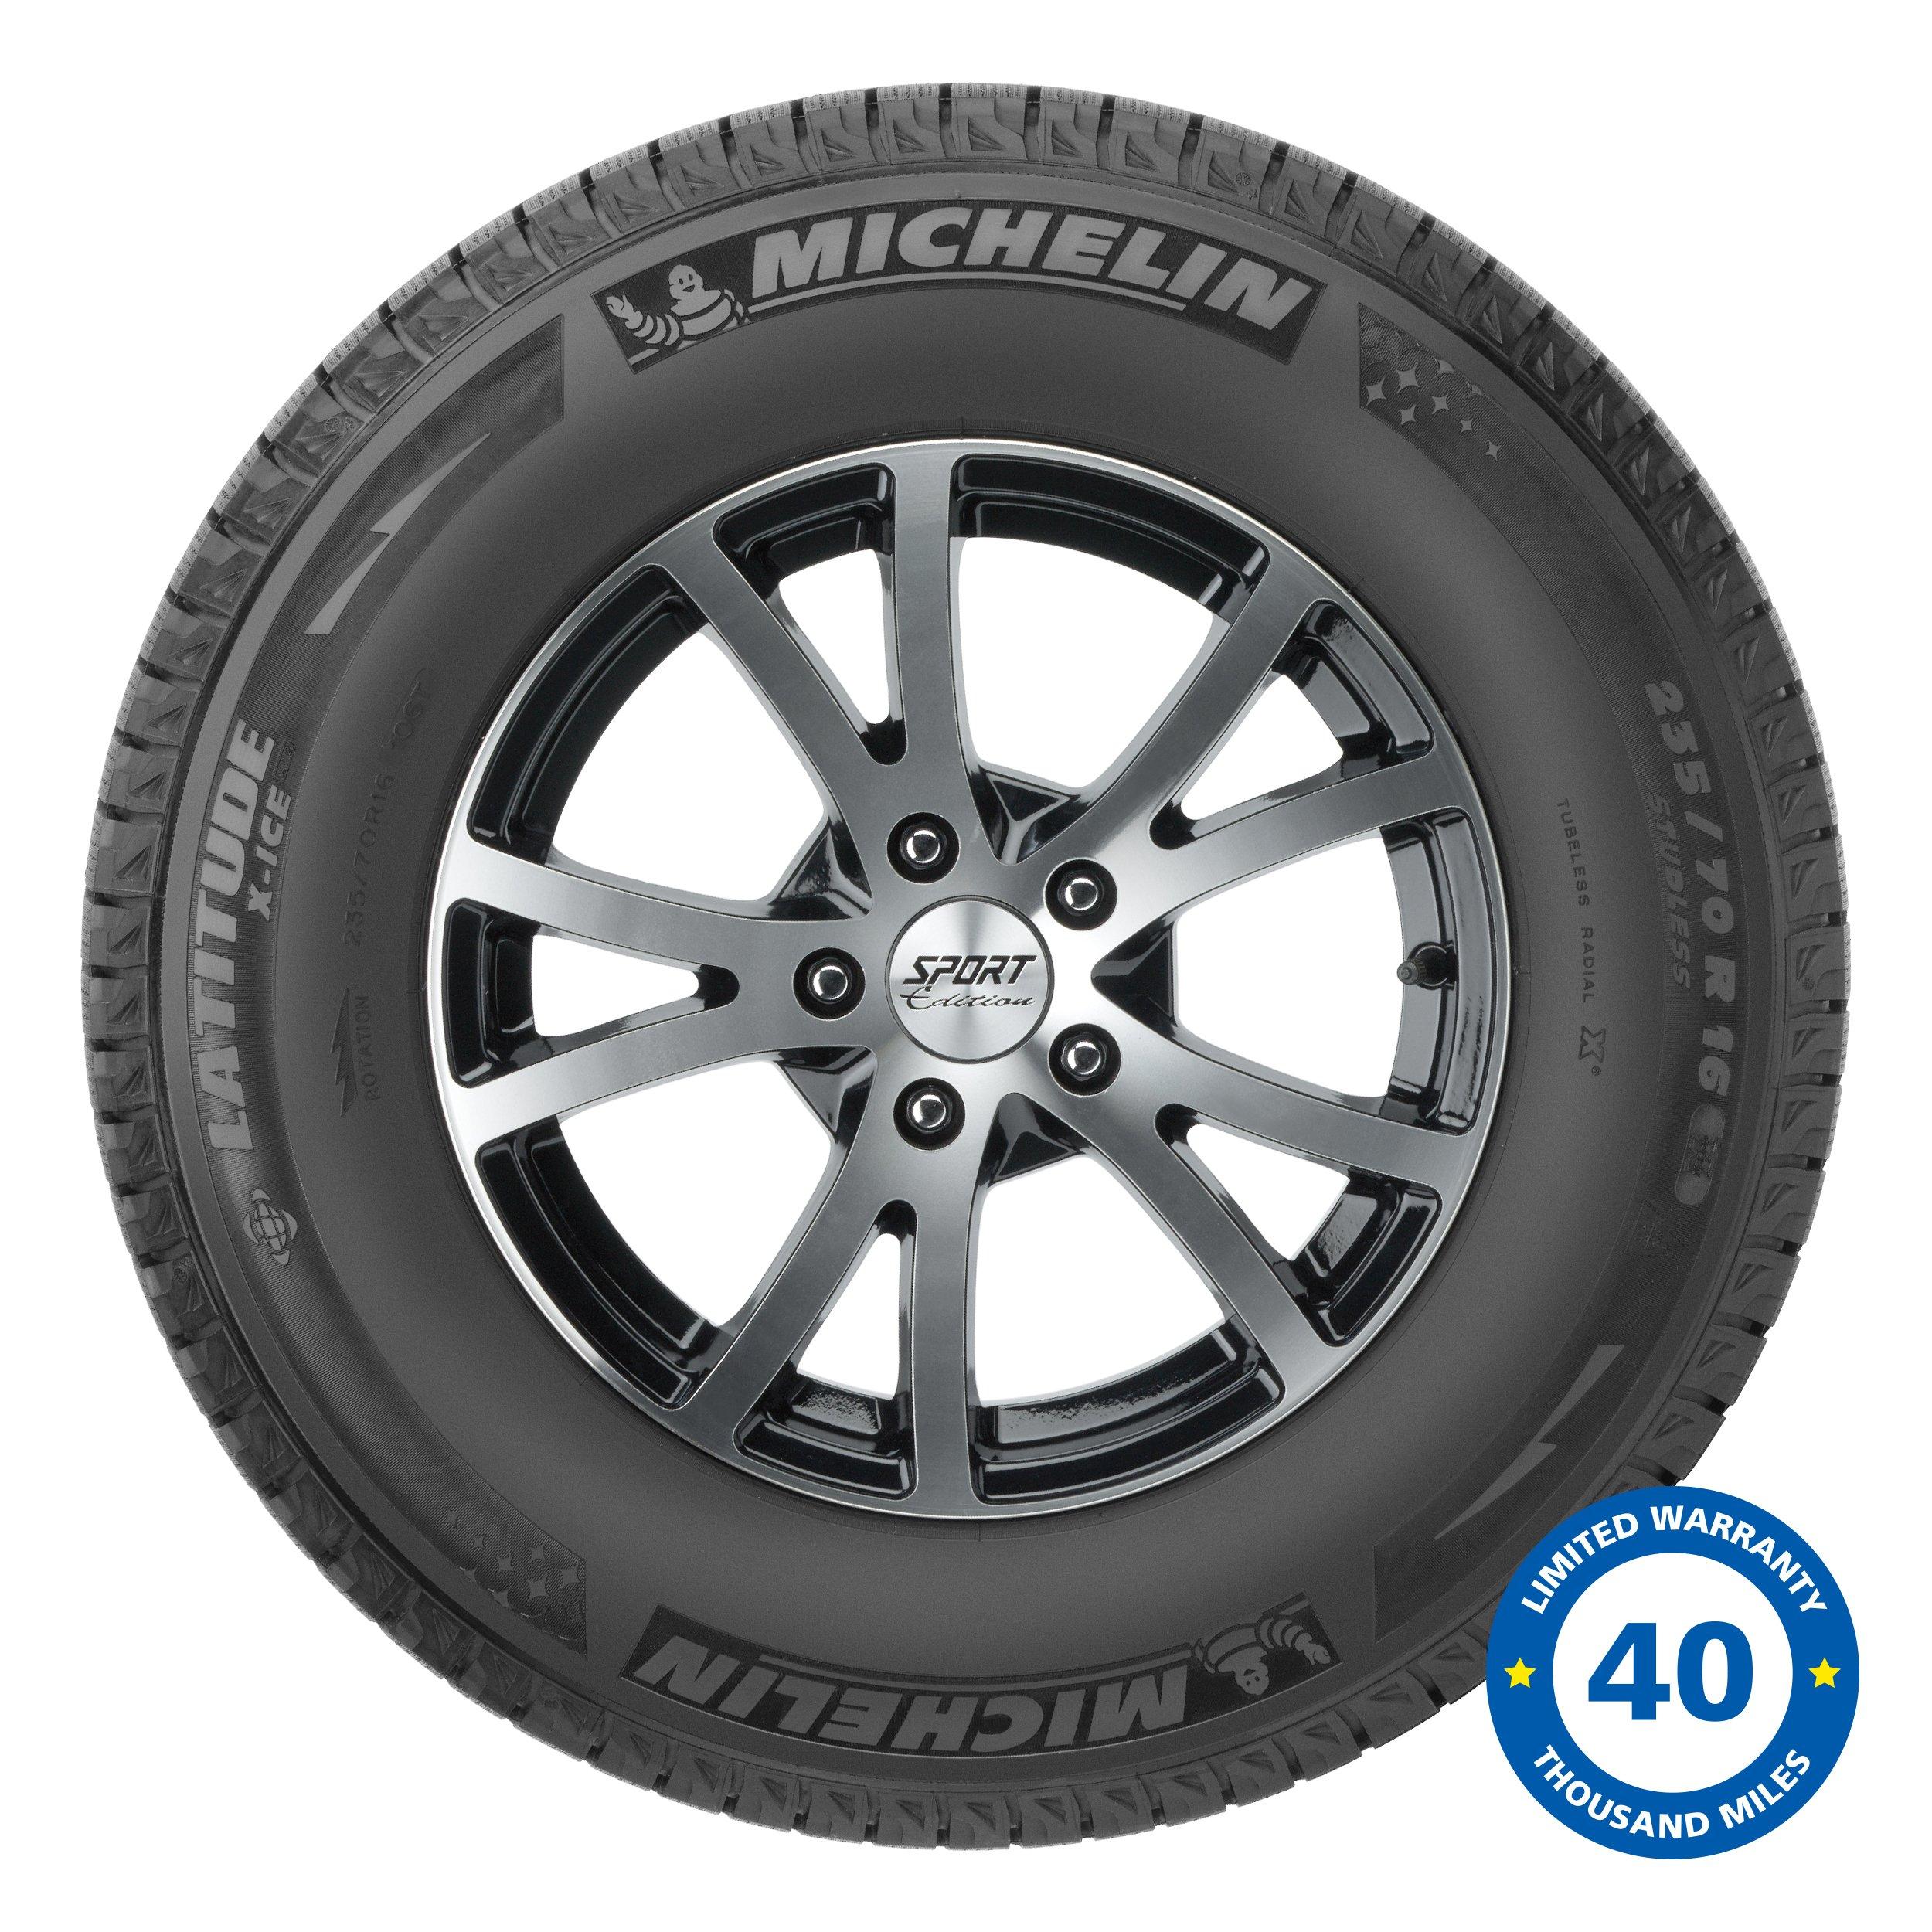 Michelin Latitude X-Ice XI2 Winter Radial Tire - 265/70R17 115T